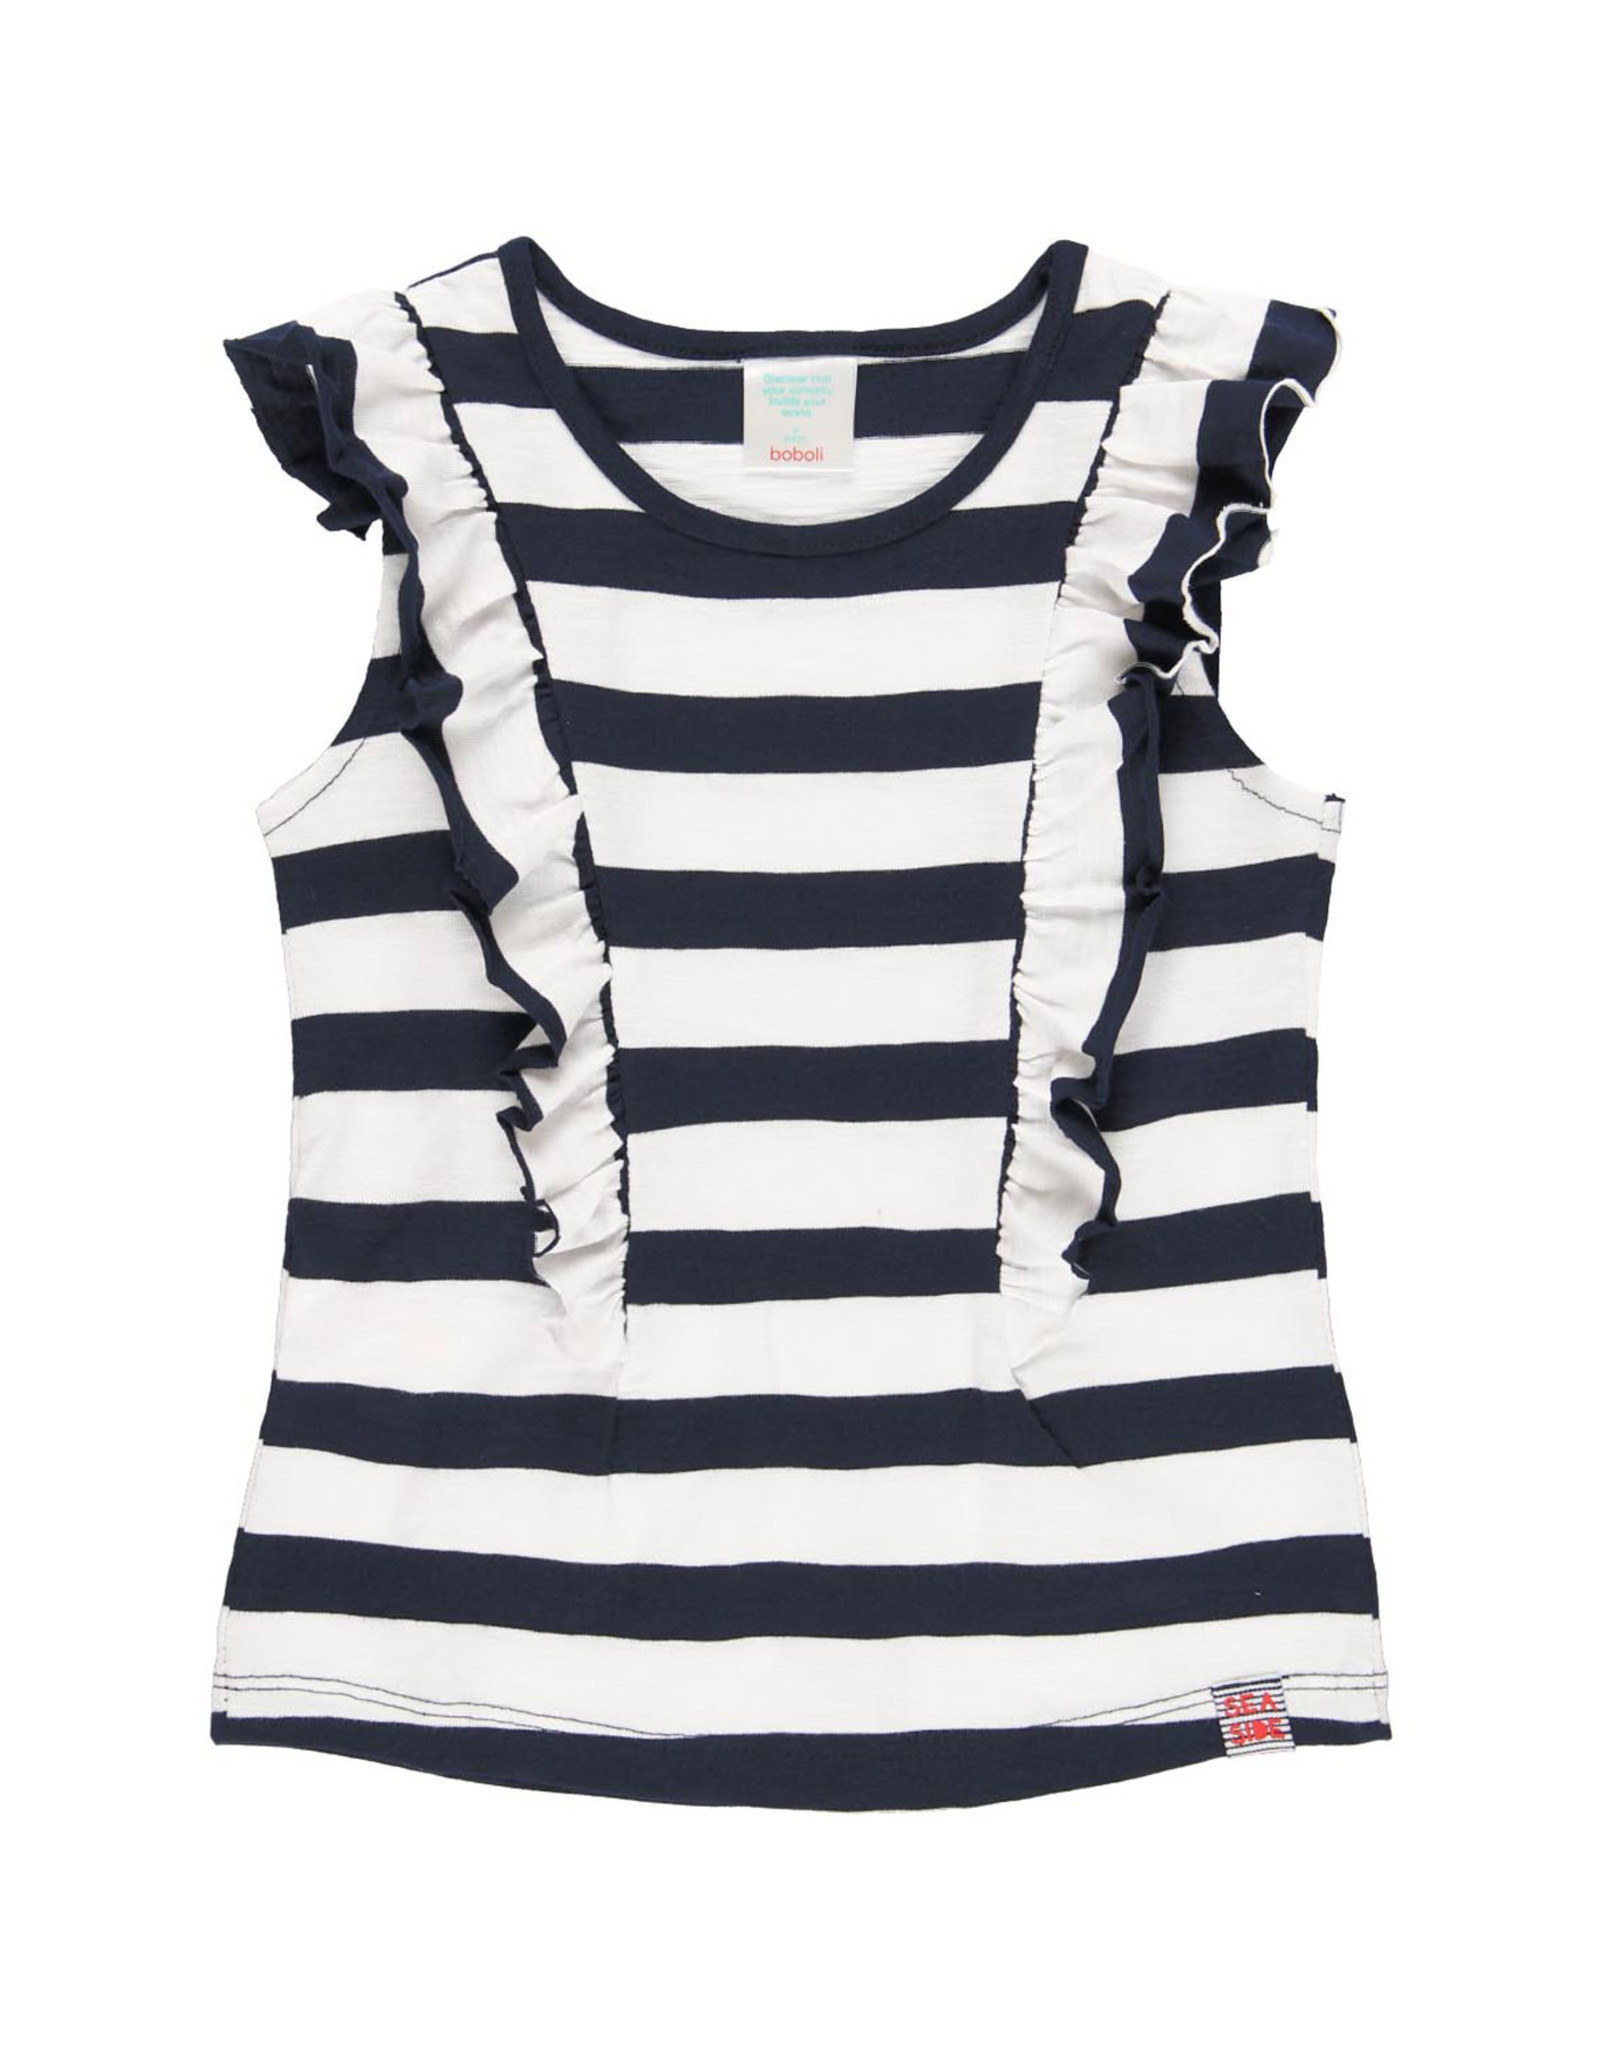 Boboli Sleeveless Striped Shirt, Ruffles, Navy + White